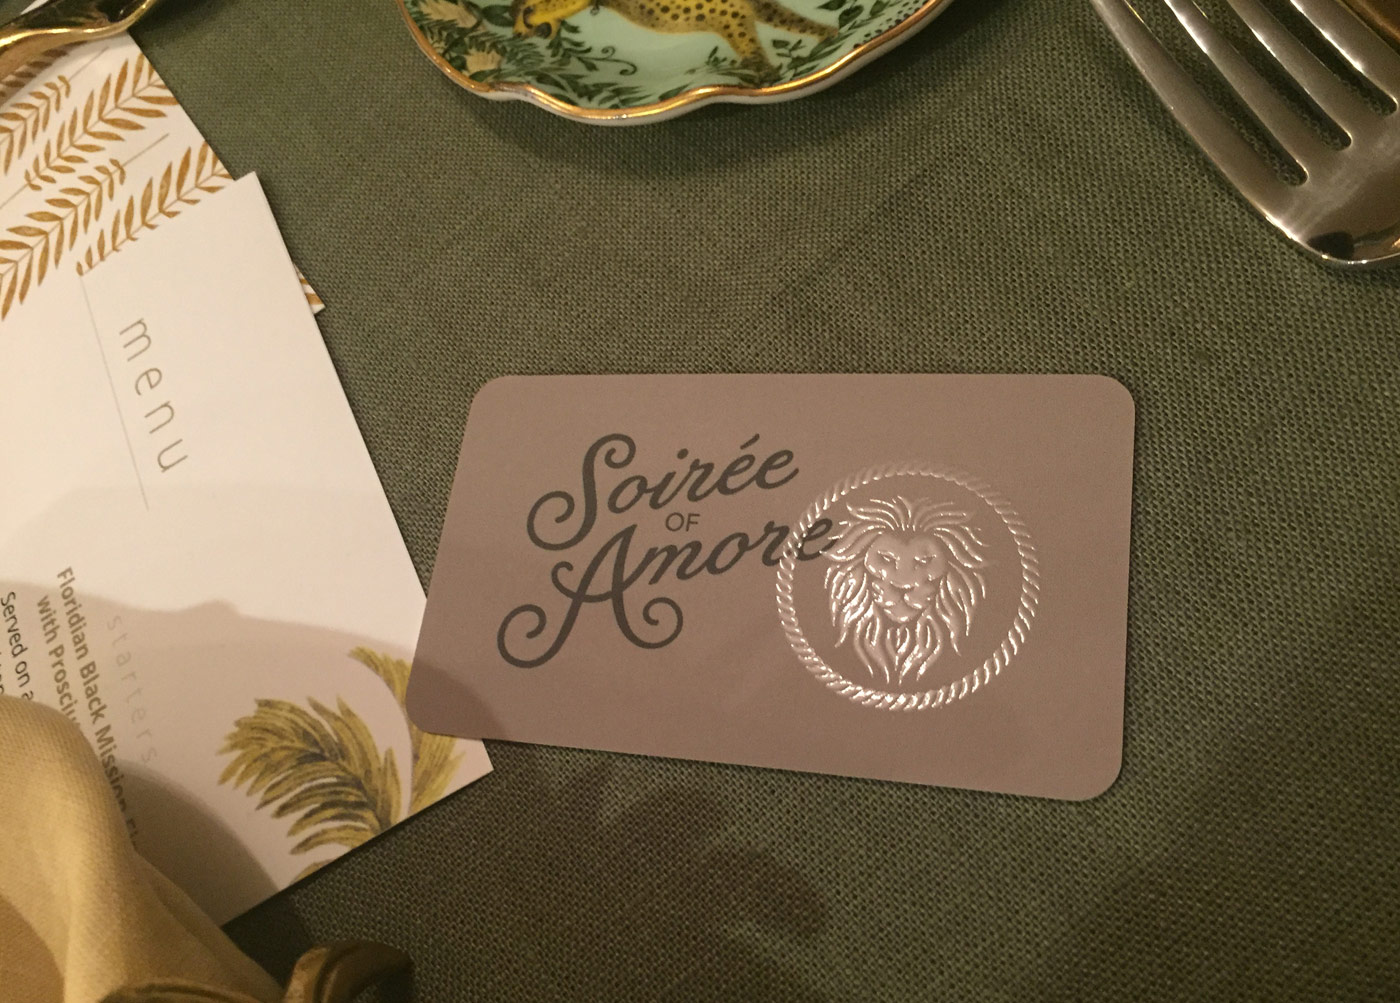 Soirée of Amore Logo & Business Card